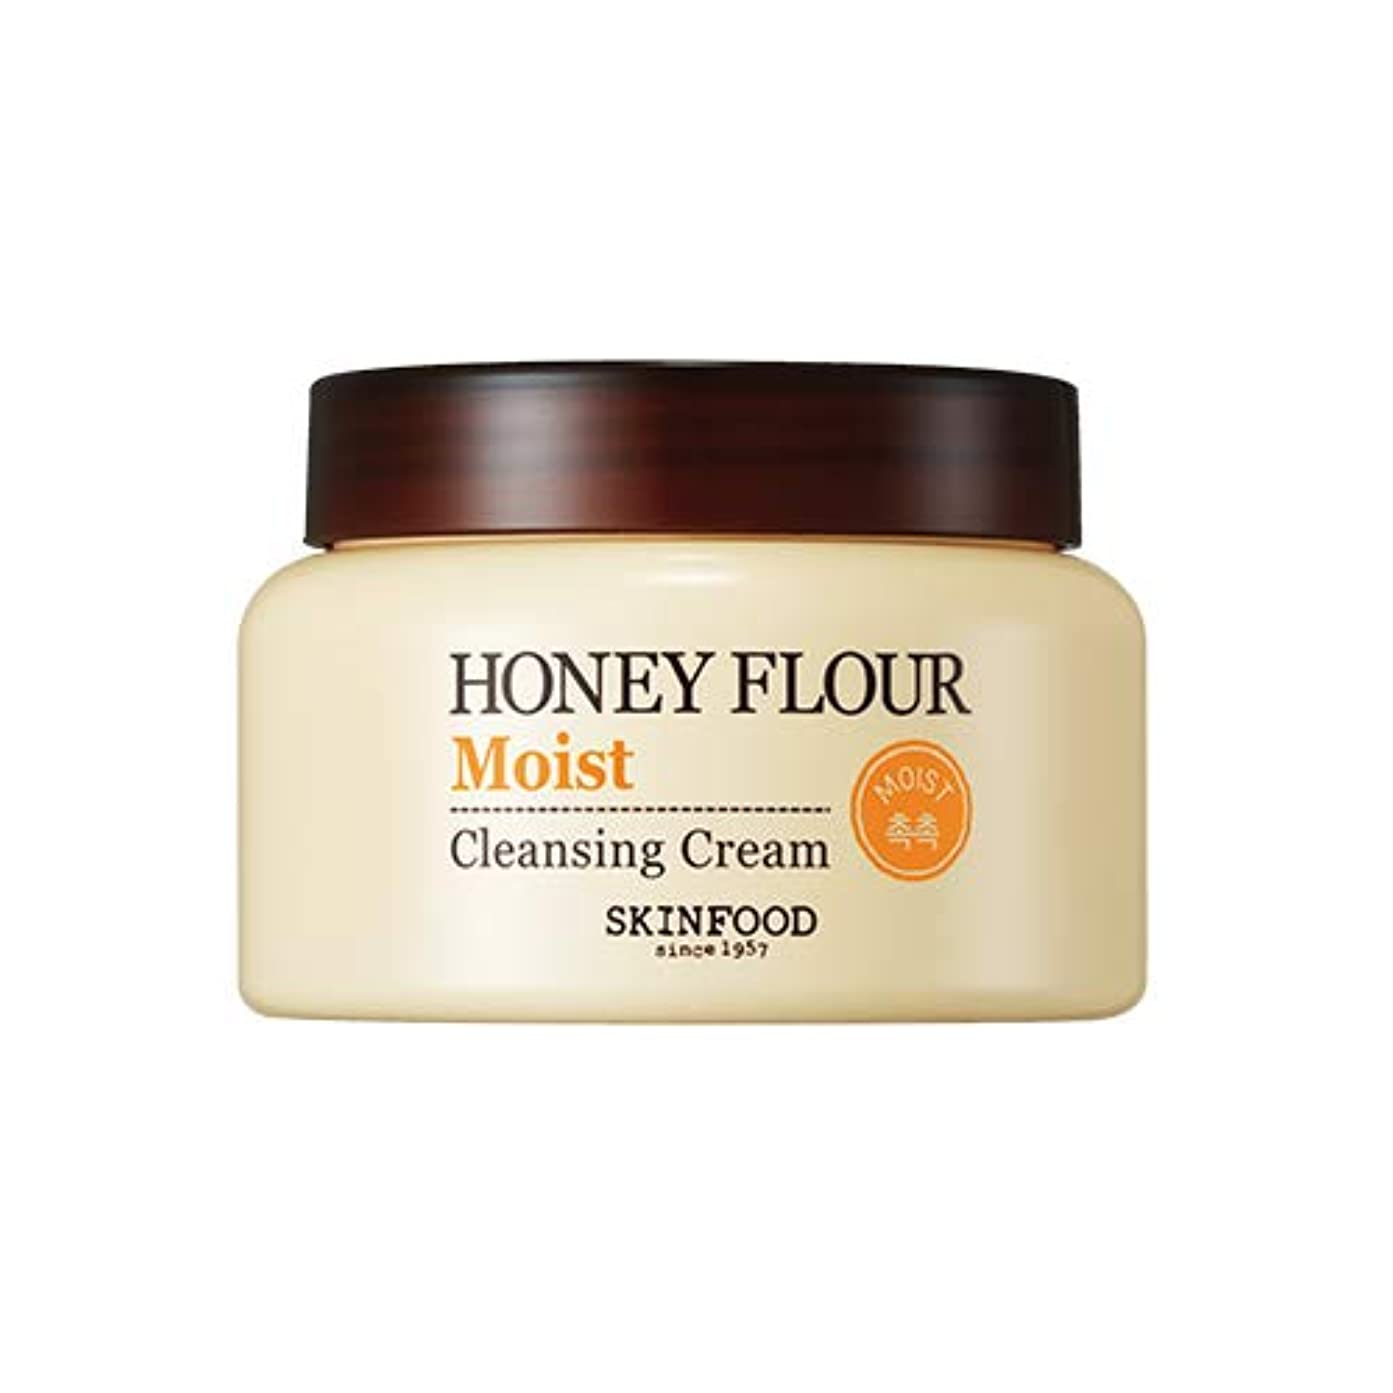 Skinfood/Honey Flour Moist Cleansing Cream/ハニーフラワーモイストクレンジングクリーム/225ml [並行輸入品]